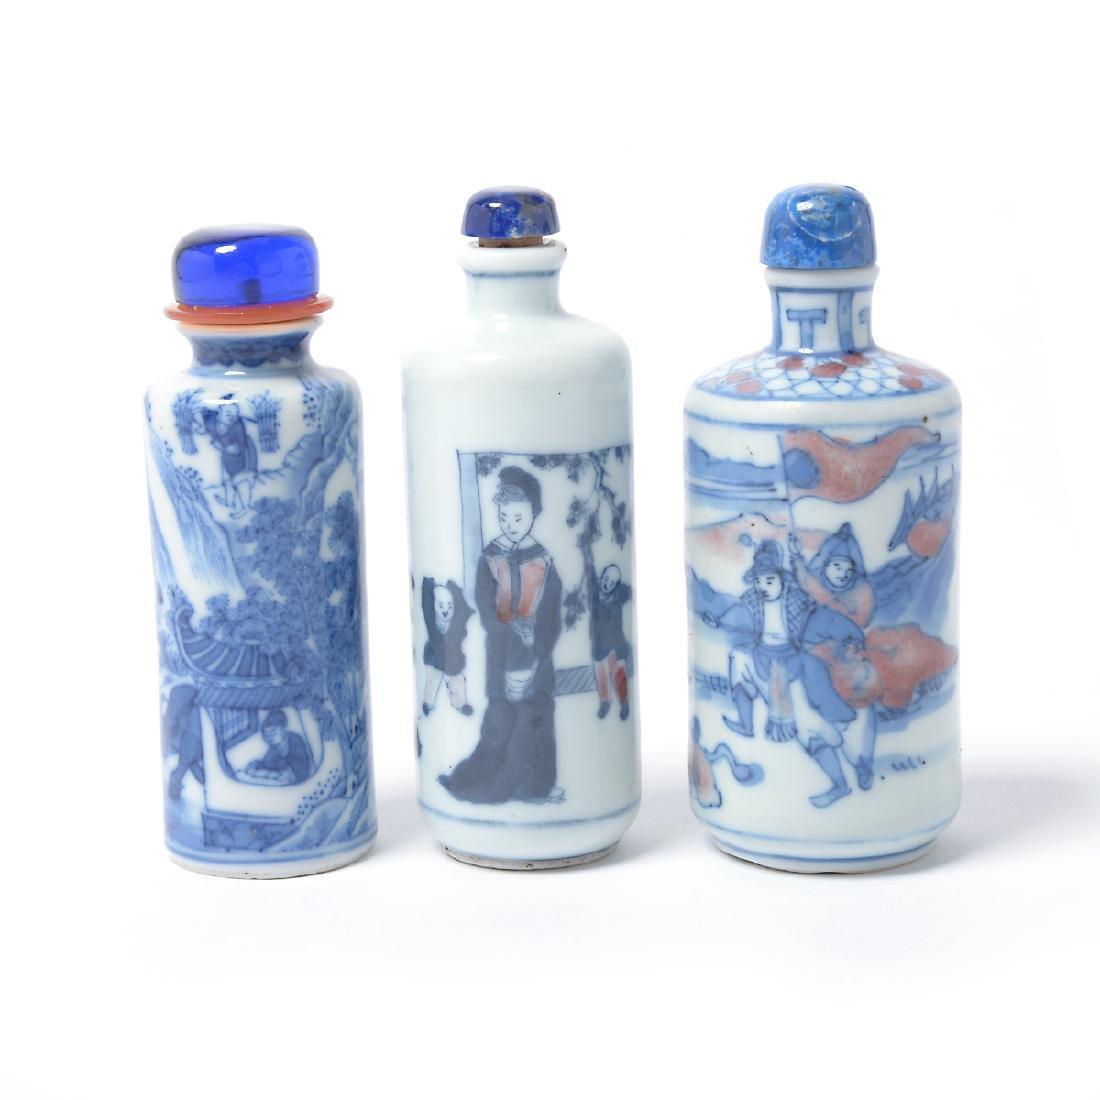 Three Underglaze Blue Porcelain Snuff Bottles, 19th C - 2